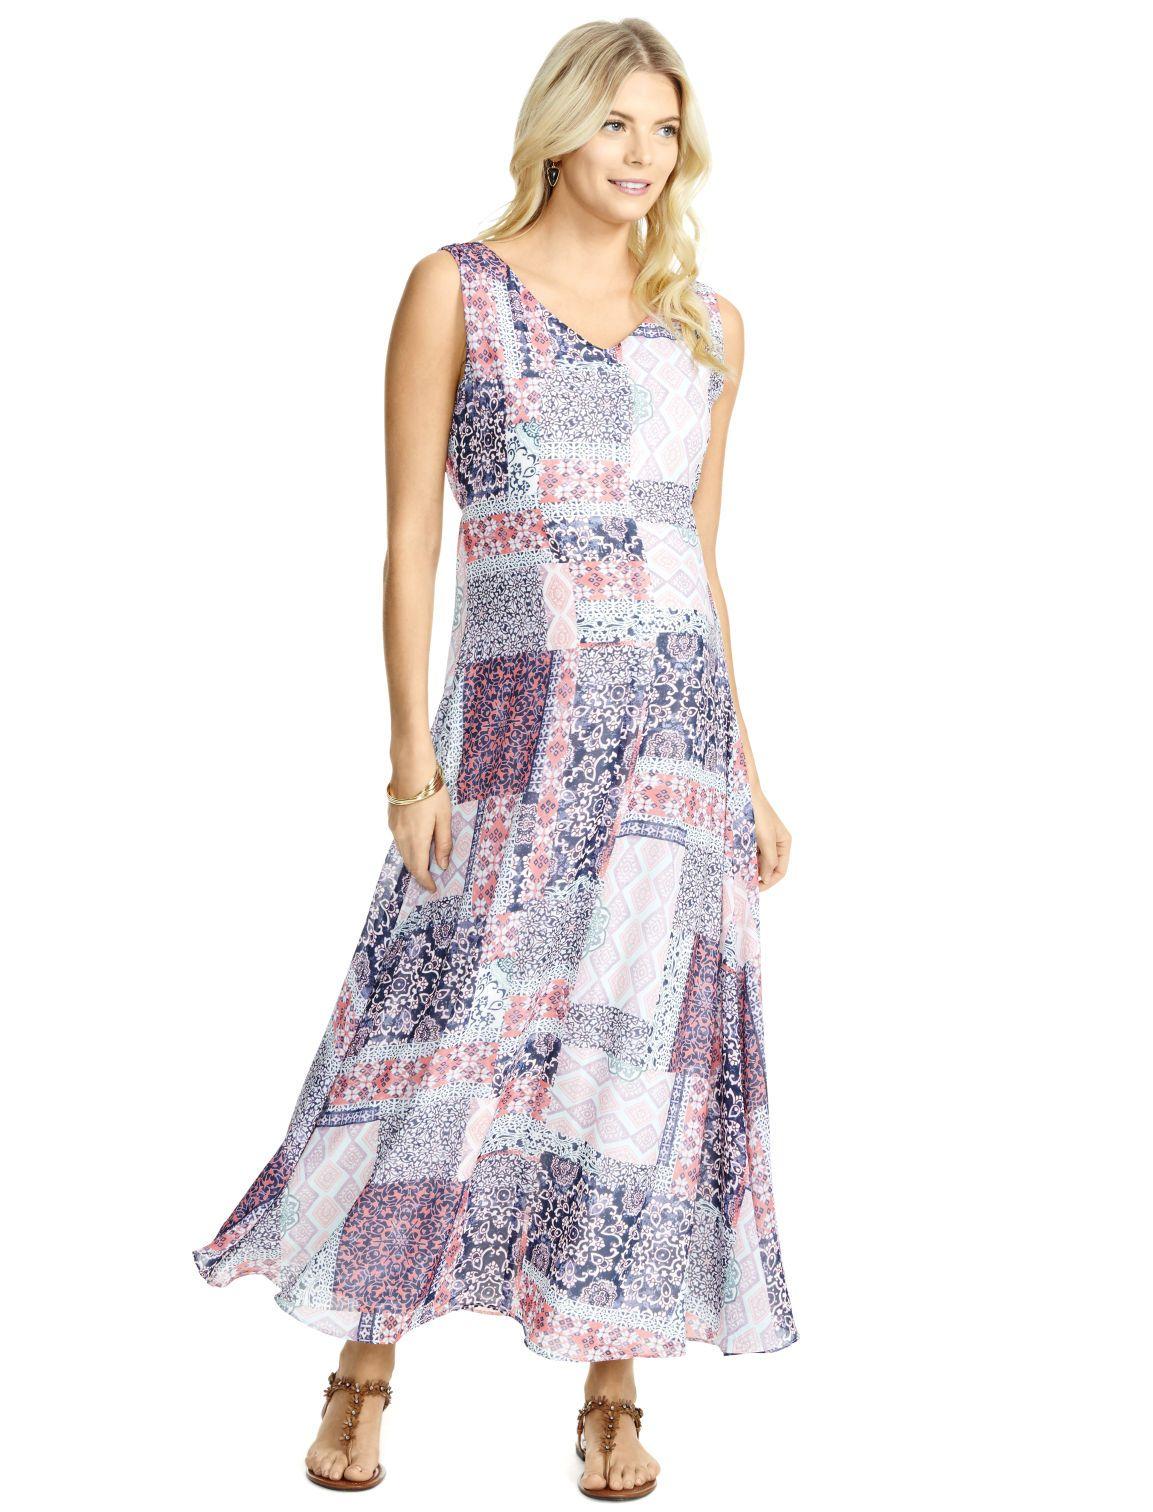 7e852c64b188 Motherhood Maternity Jessica Simpson Long Sleeve Empire Waist Maternity  Maxi Dress